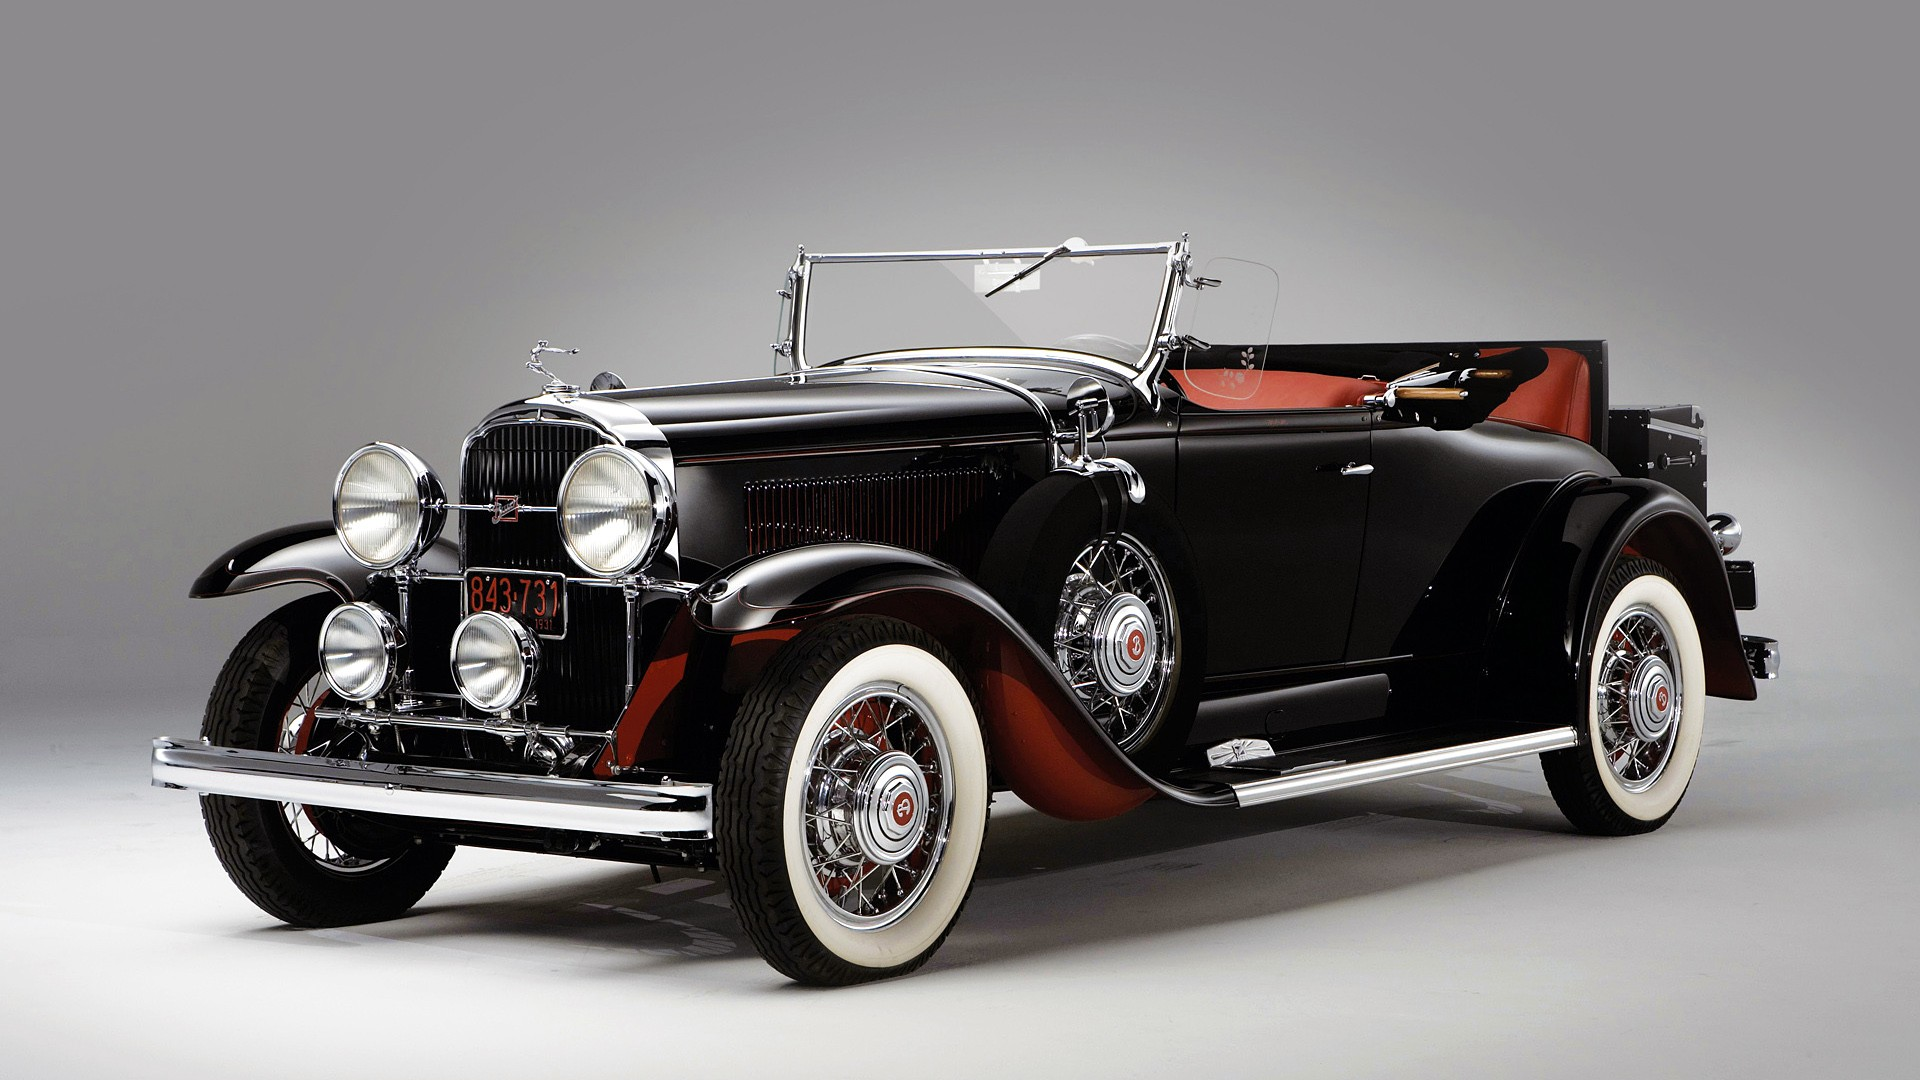 wallpaper classic cars vintage images 1920x1080 1920x1080